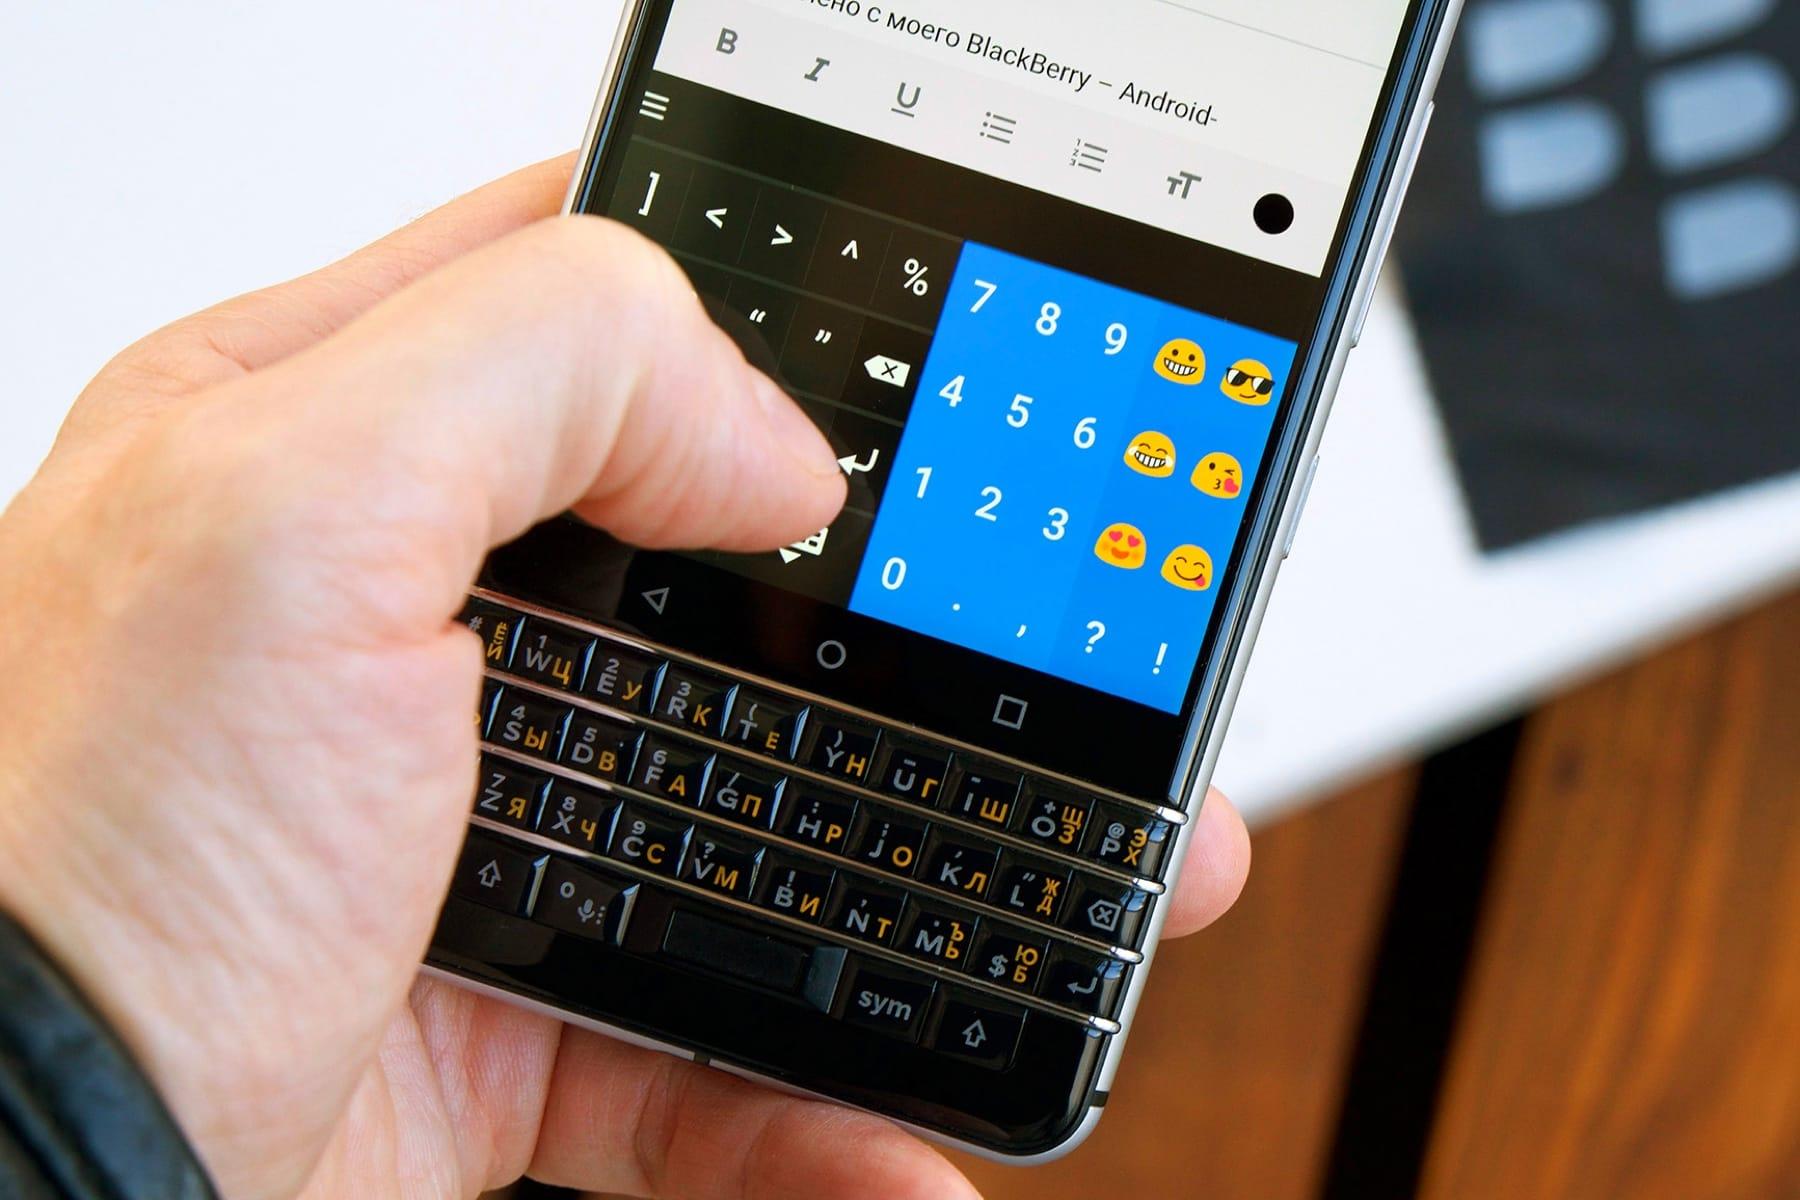 0 Black Berry Ghost – безрамочный смартфон премиум-класса с двойной камерой на Android 8.1 Oreo